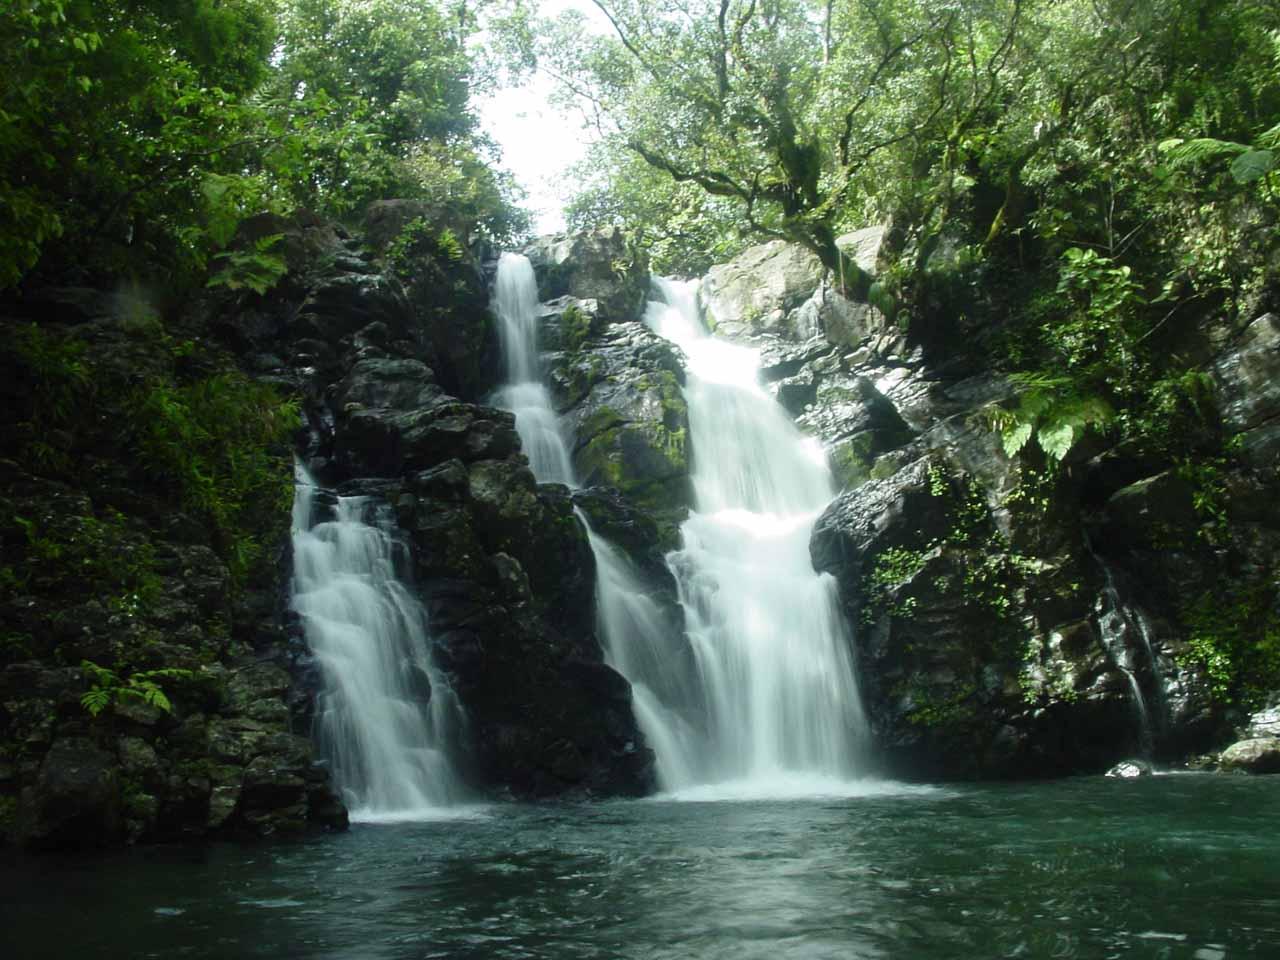 Finally, the Upper Tavoro Waterfall